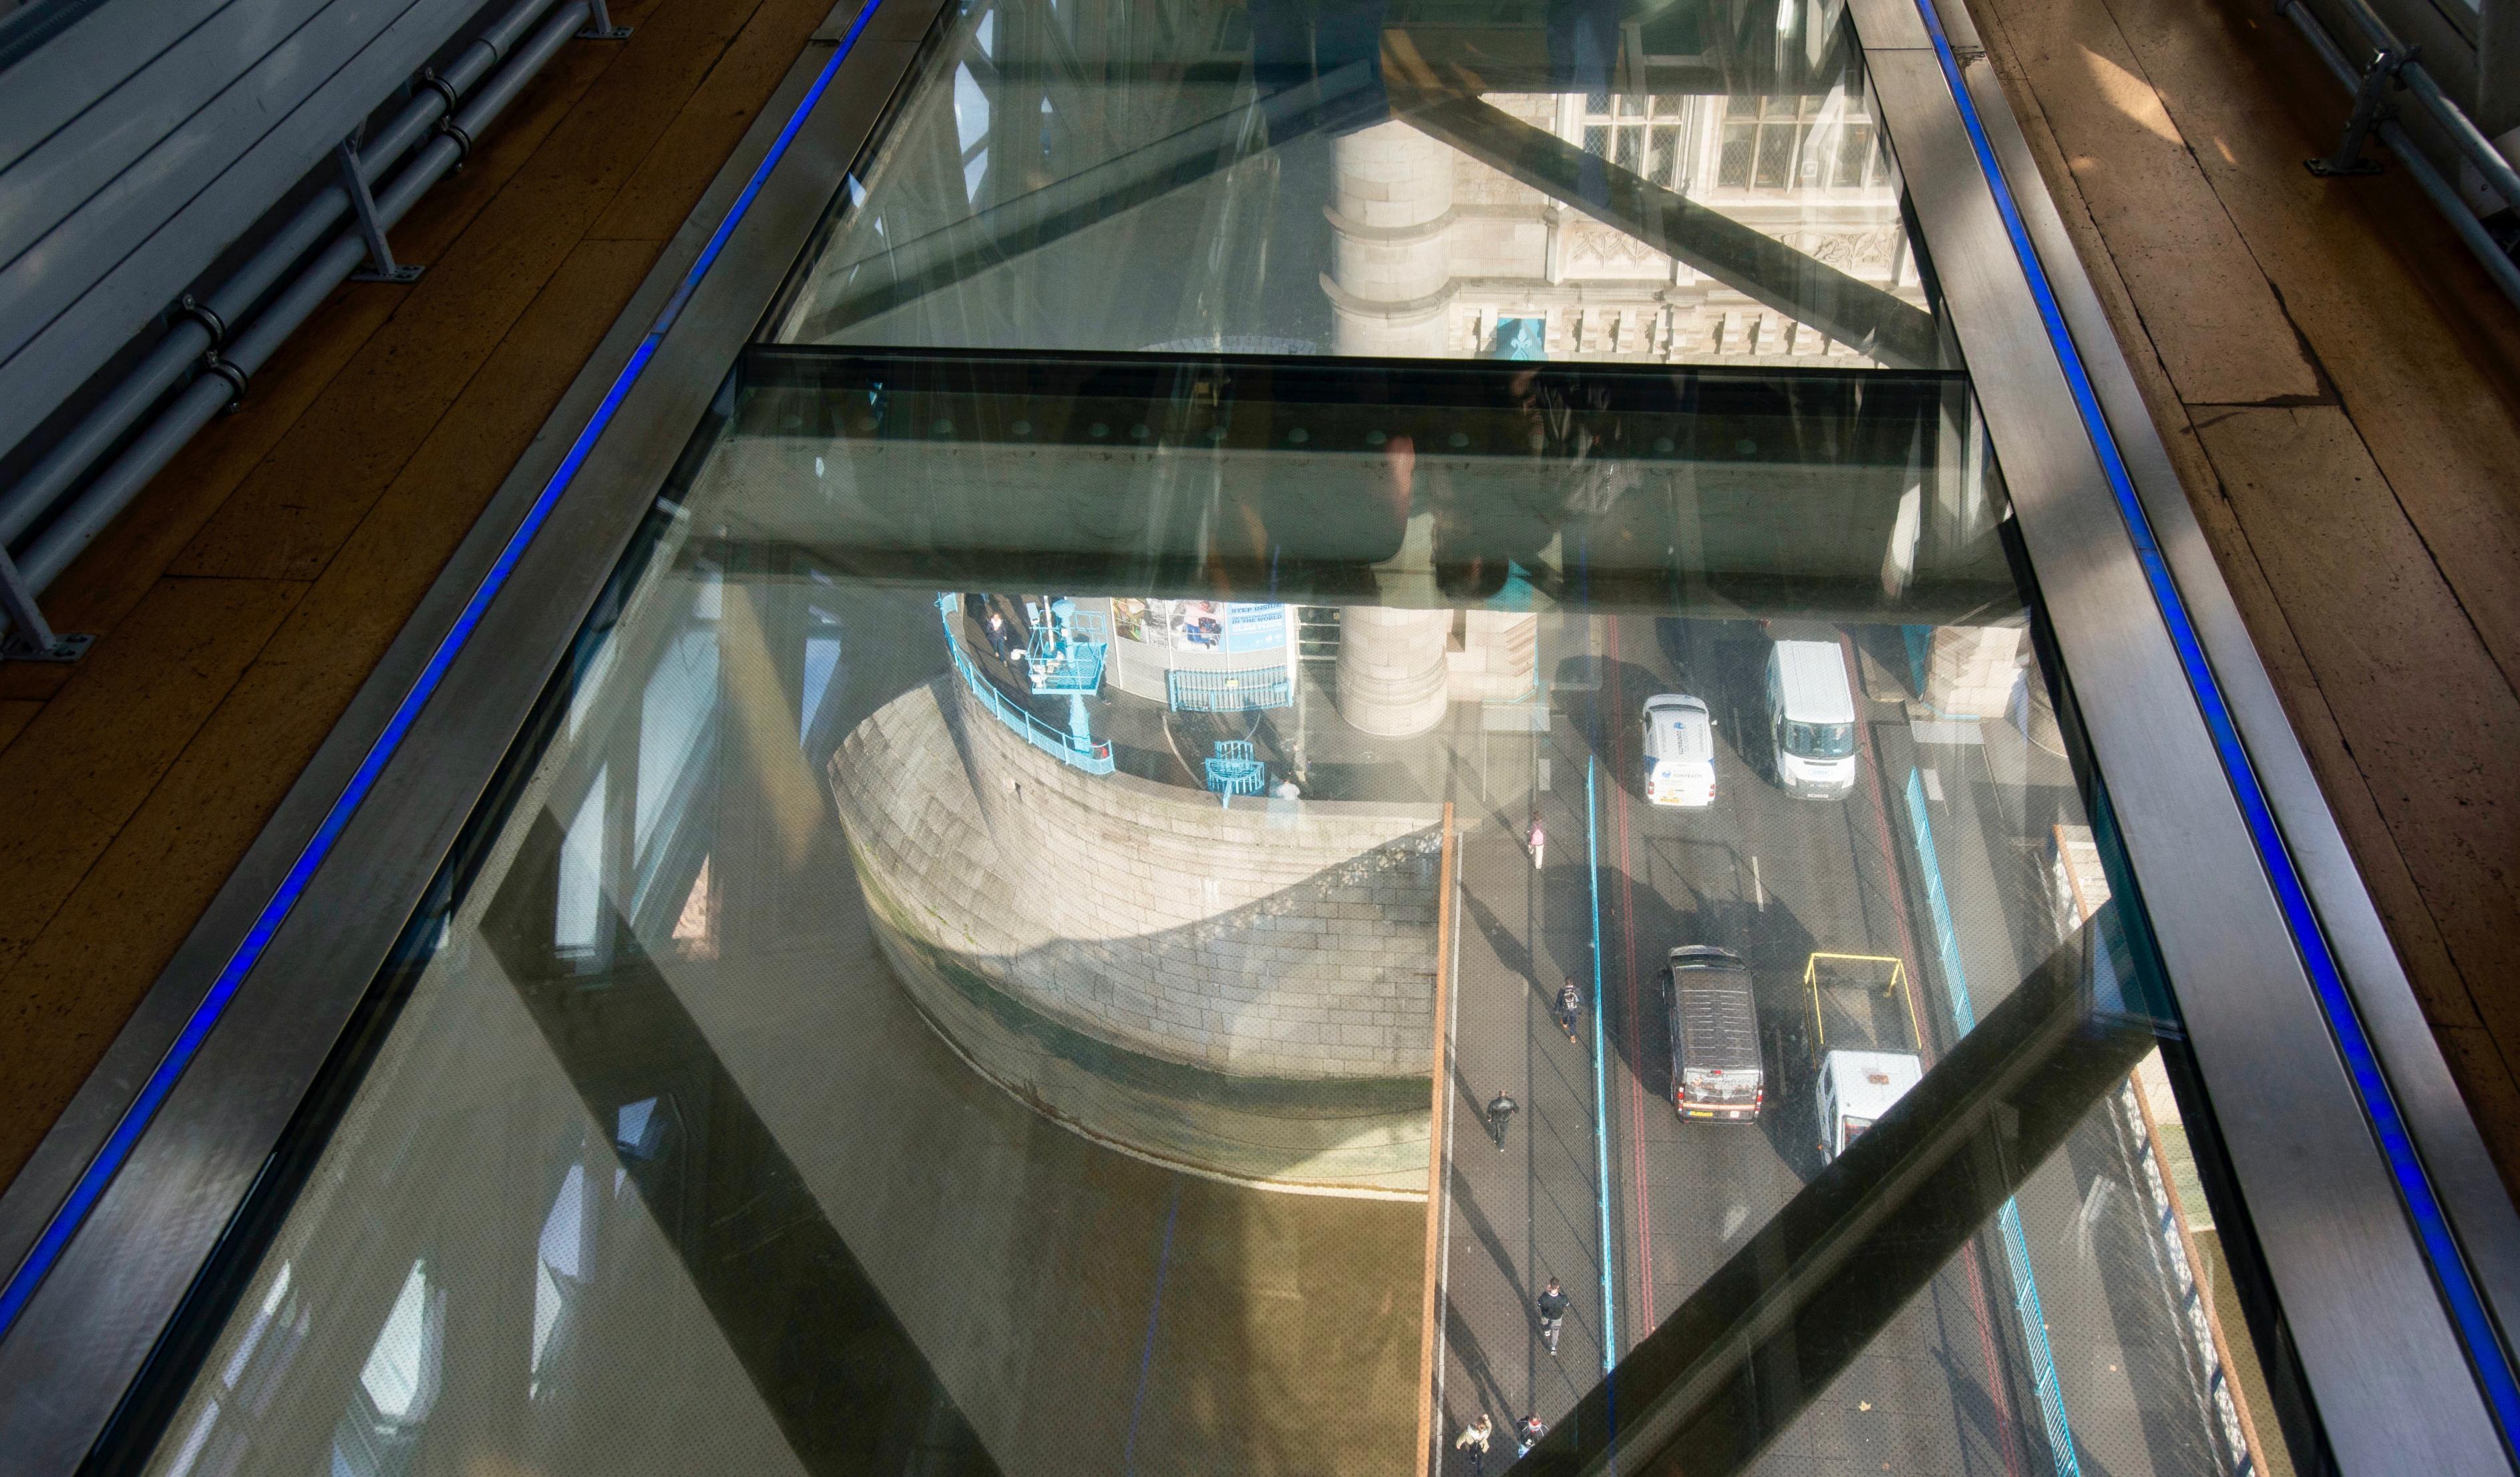 The secrets of London's bridges span the centuries   CNN Travel